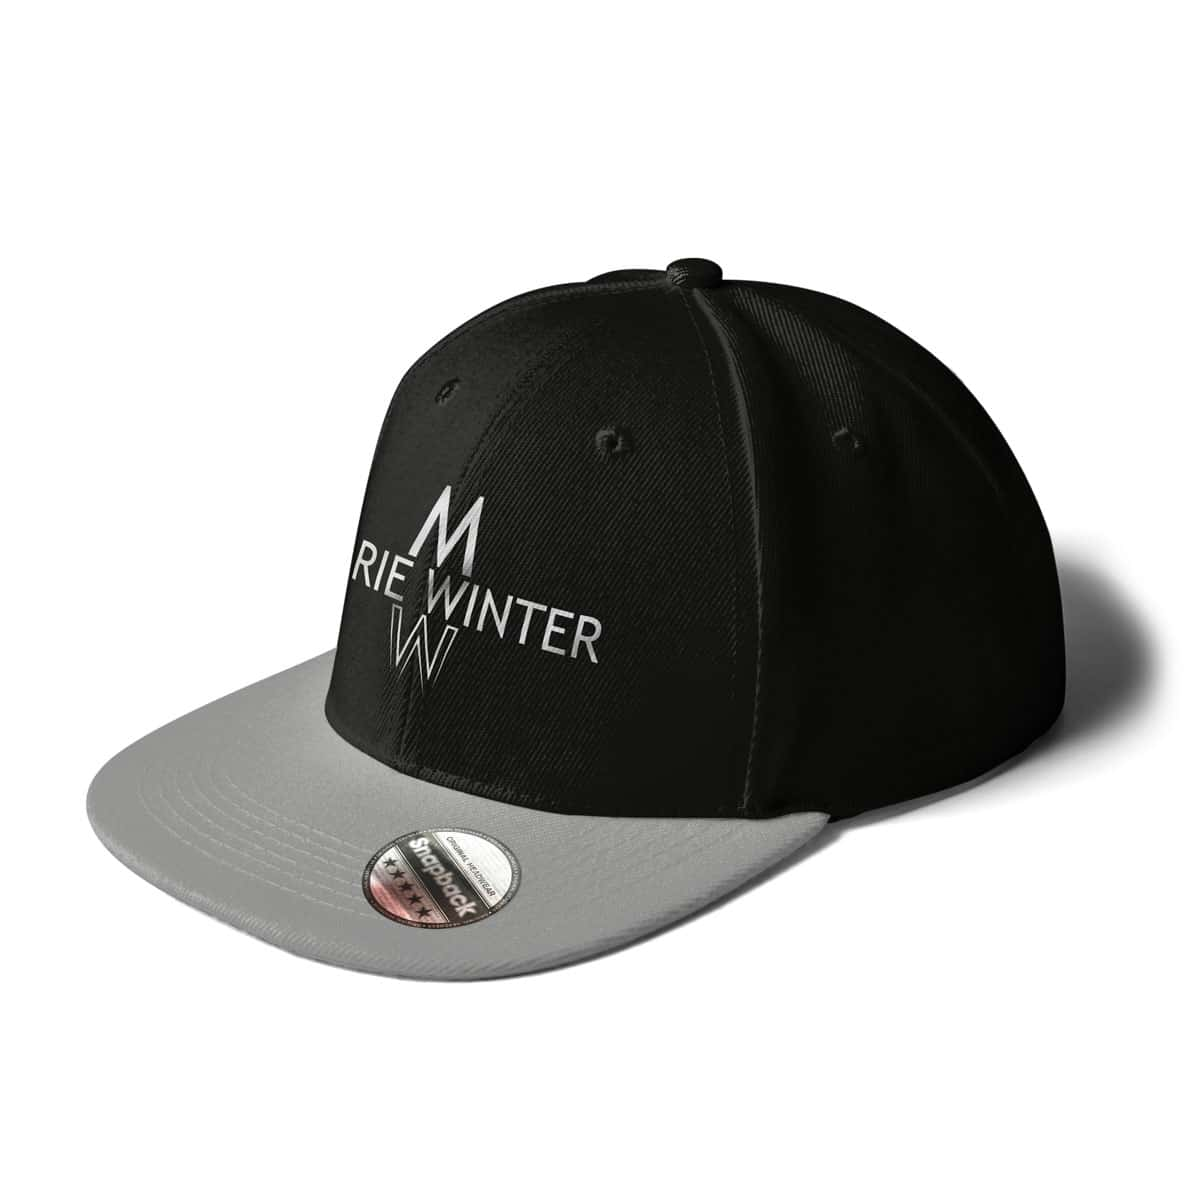 Cap Snapback Marie Winter schwarz-grau